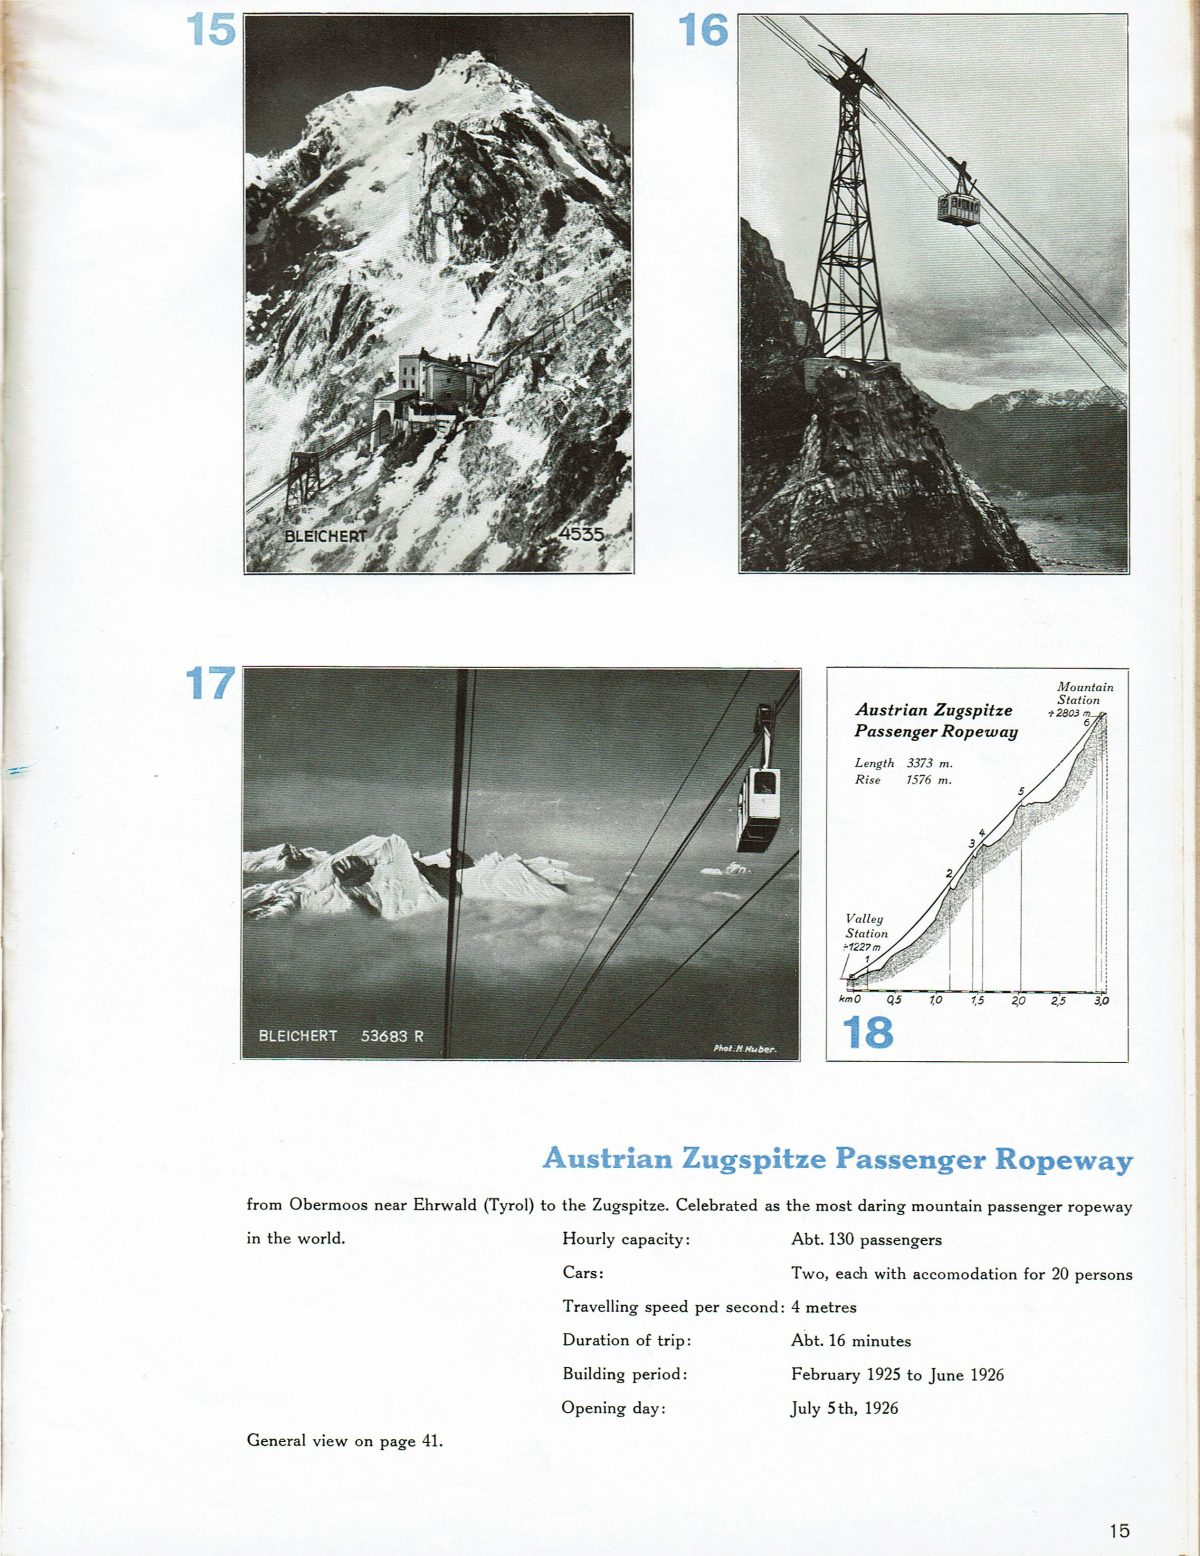 1933 Bleichert Passenger Arial Ropeways 14